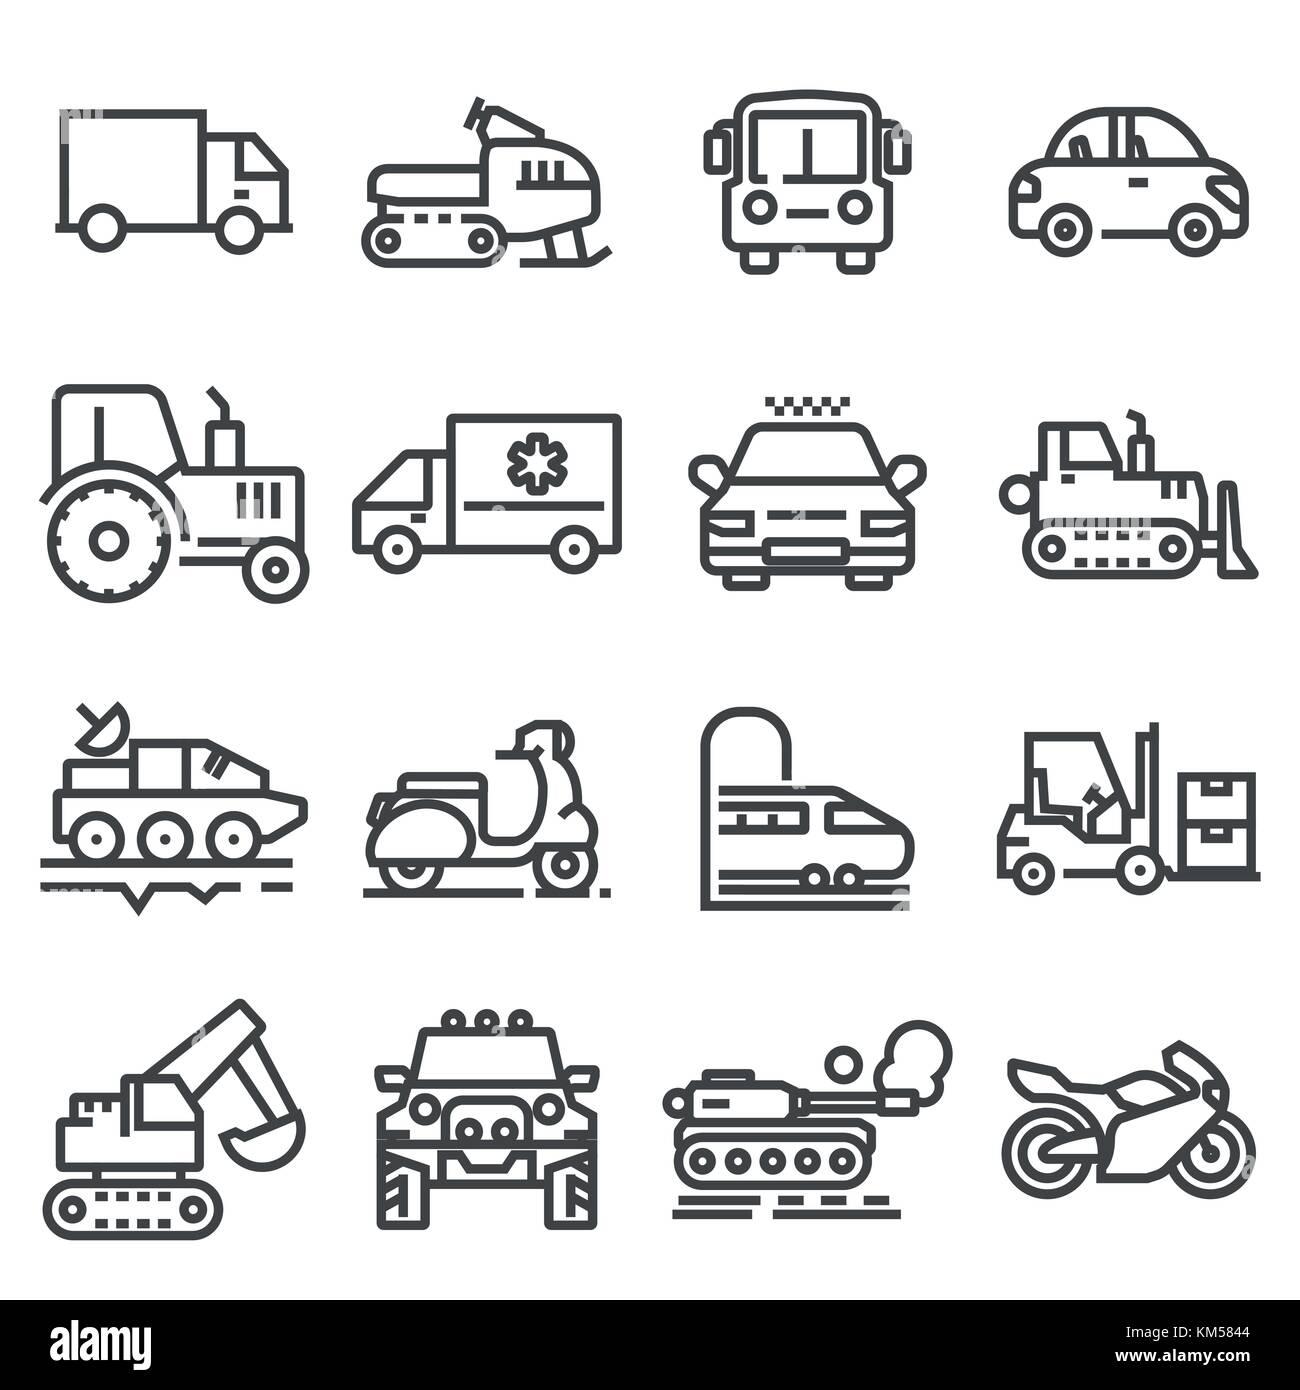 Charmant Fahrzeug Schaltplansymbole Ideen - Der Schaltplan - greigo.com